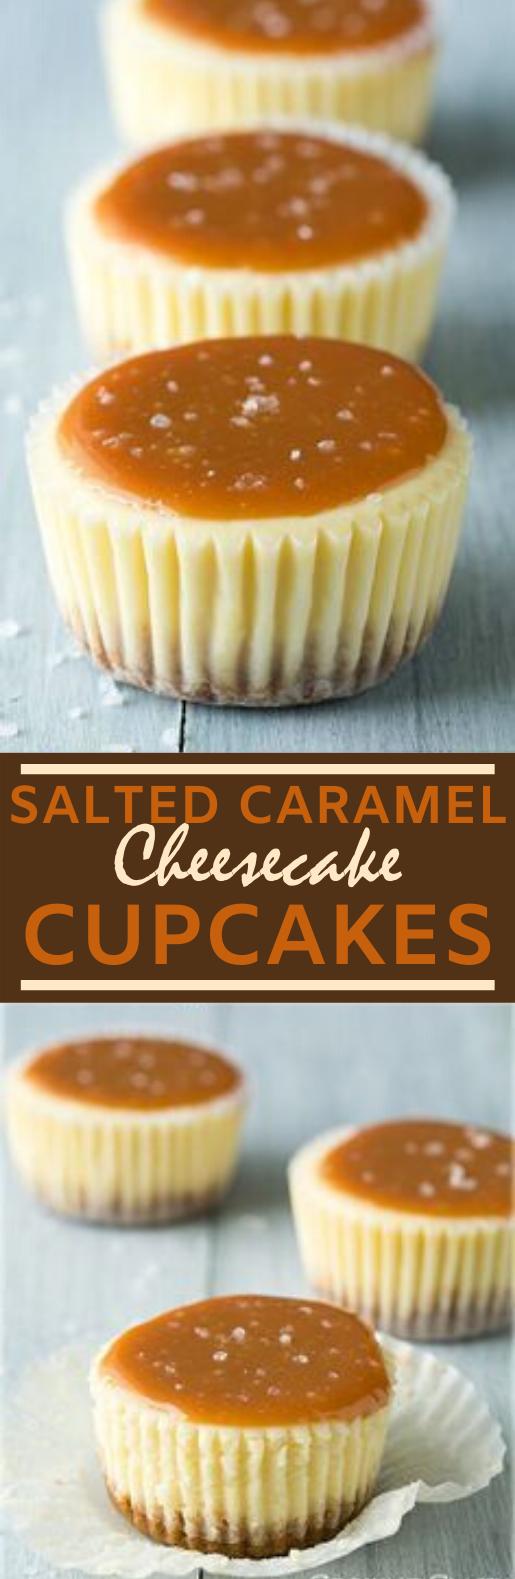 Mini Cheesecakes #cake #desserts #cheesecake #baking #cupcakes